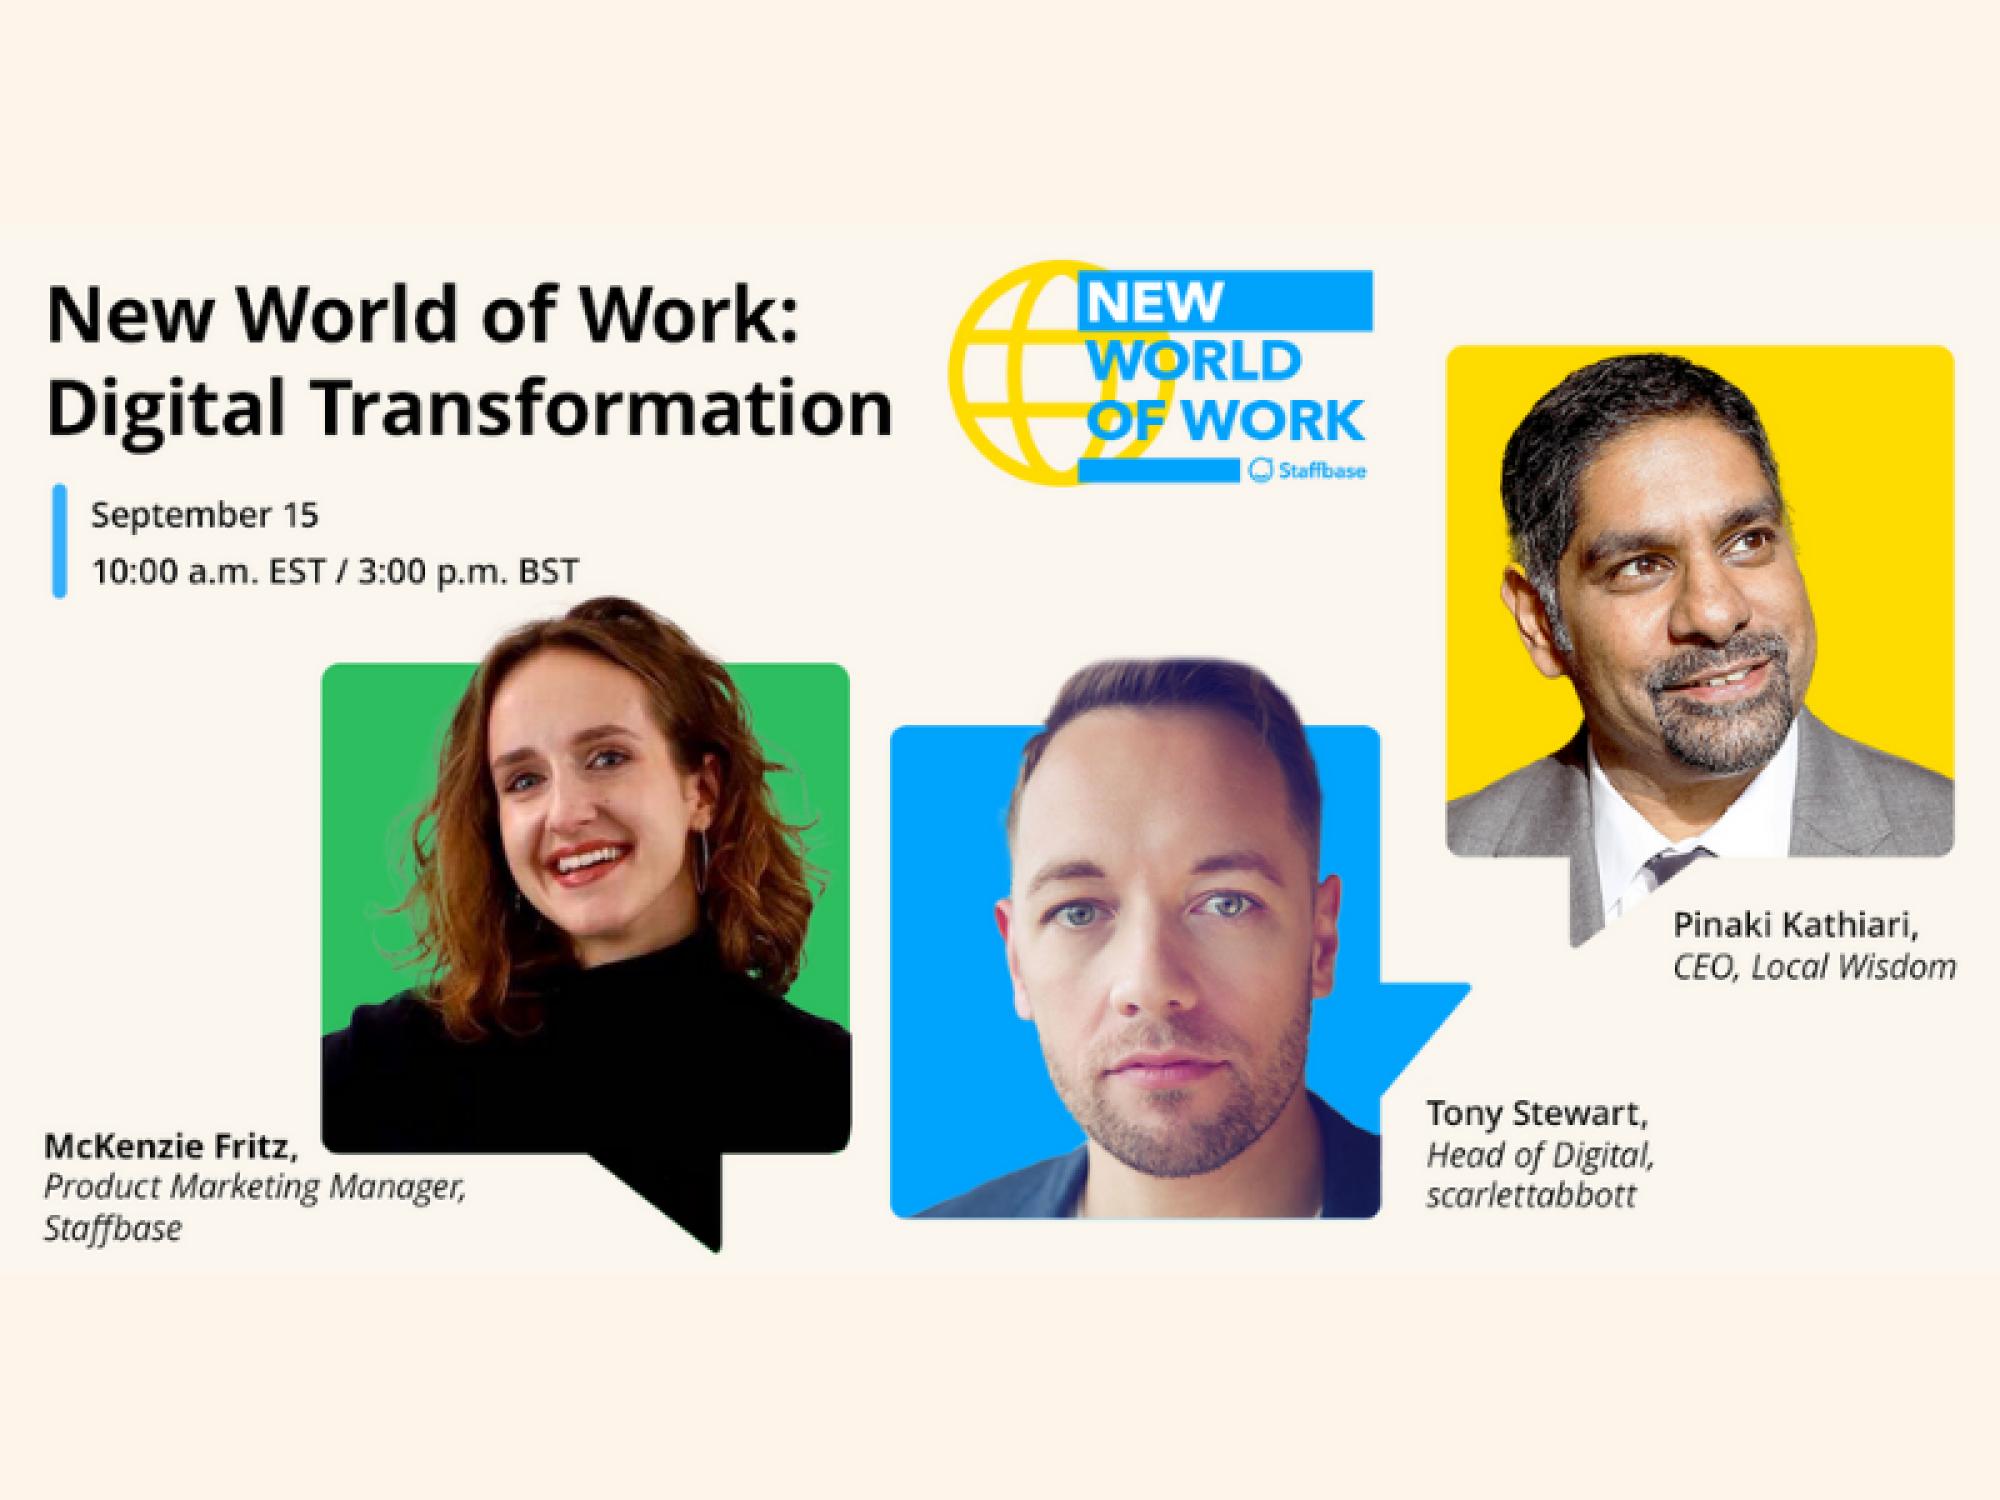 Staffbase digital transformation